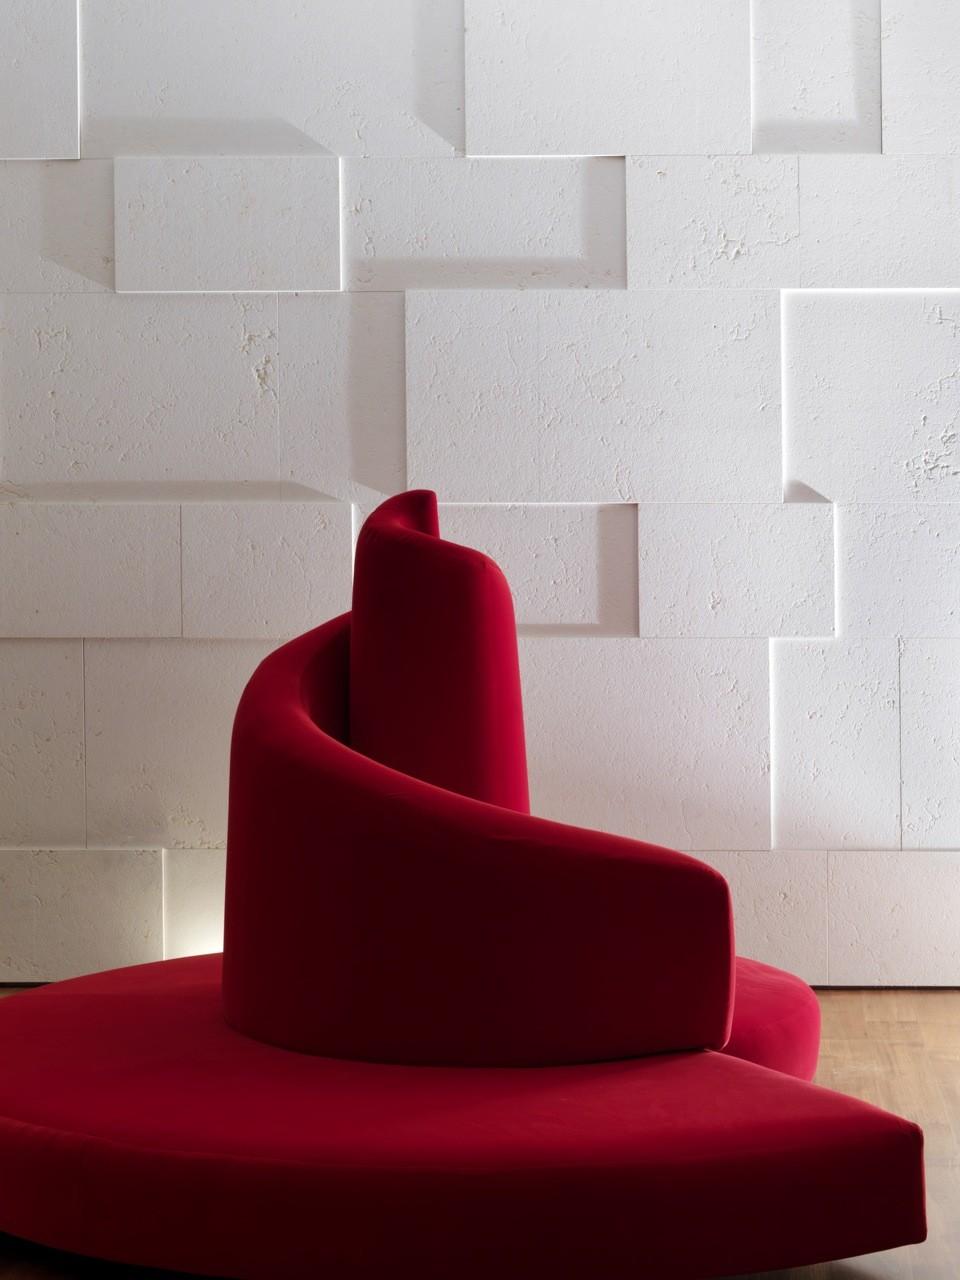 Gallery Of Horizontal Space House Damilano Studio Architects 9 - Horizontal-space-by-duilio-damilano